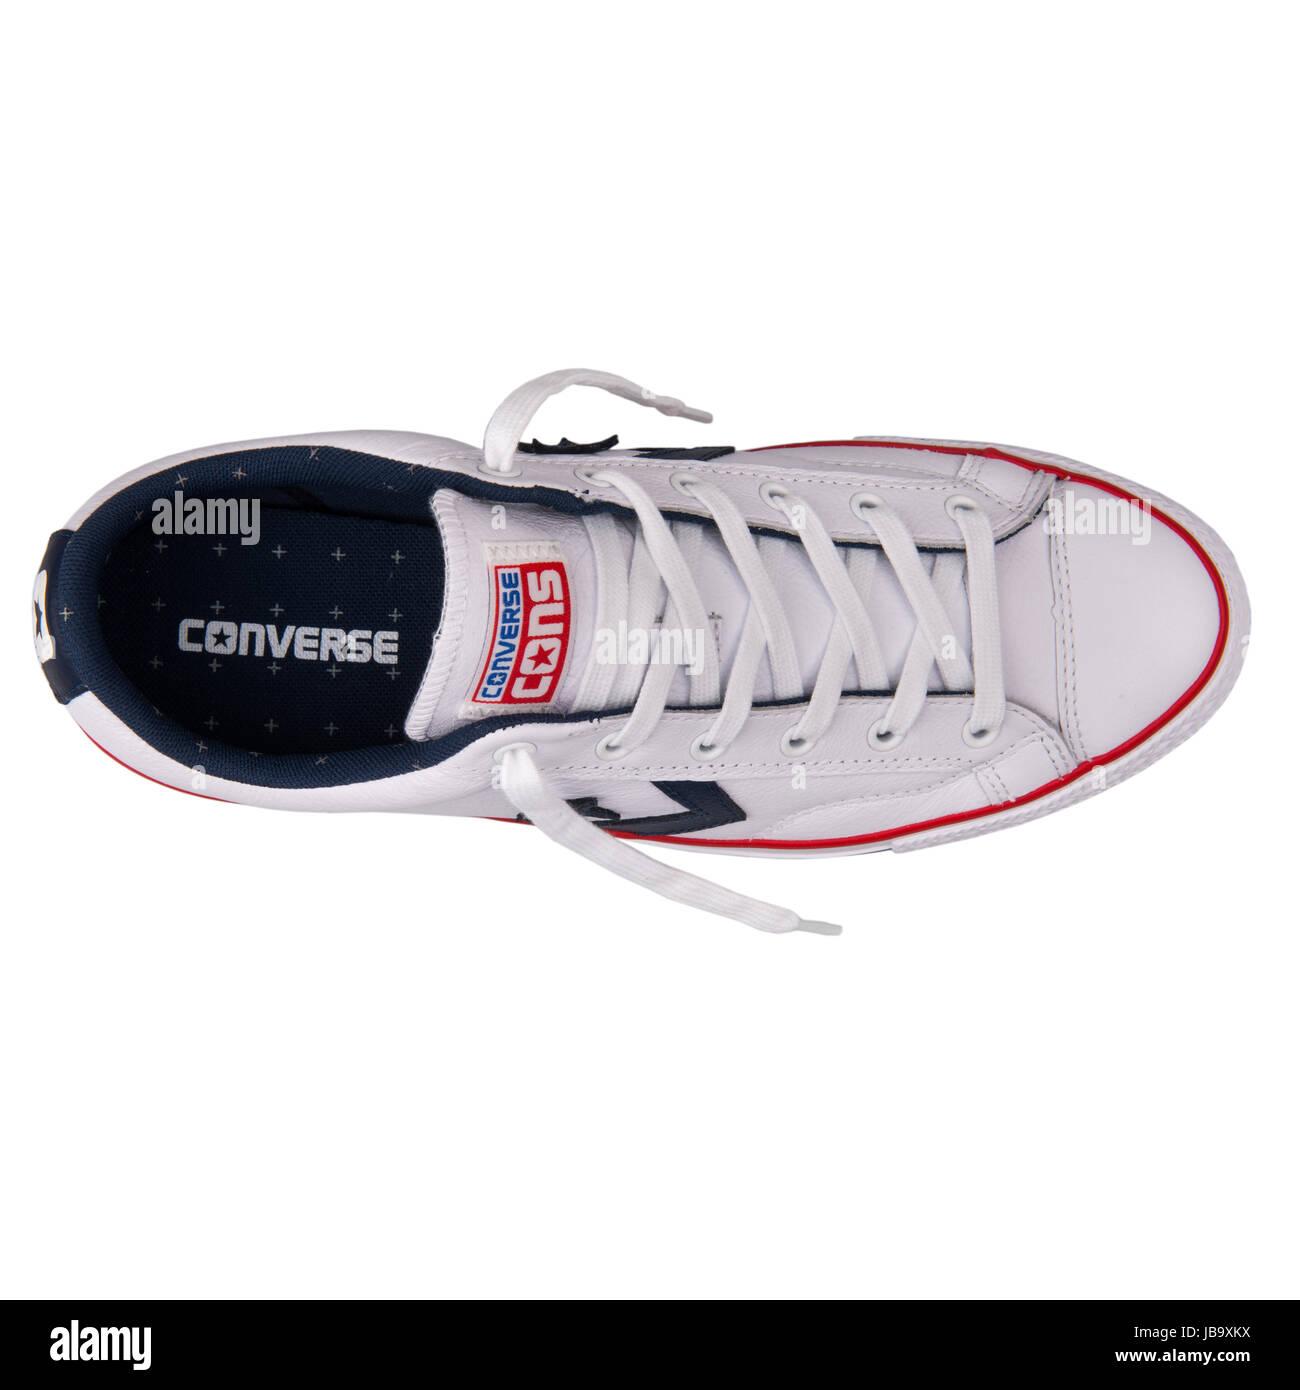 832b0e269c2e Converse Chuck Taylor All Star Player OX White Unisex Schuhe - 149771C